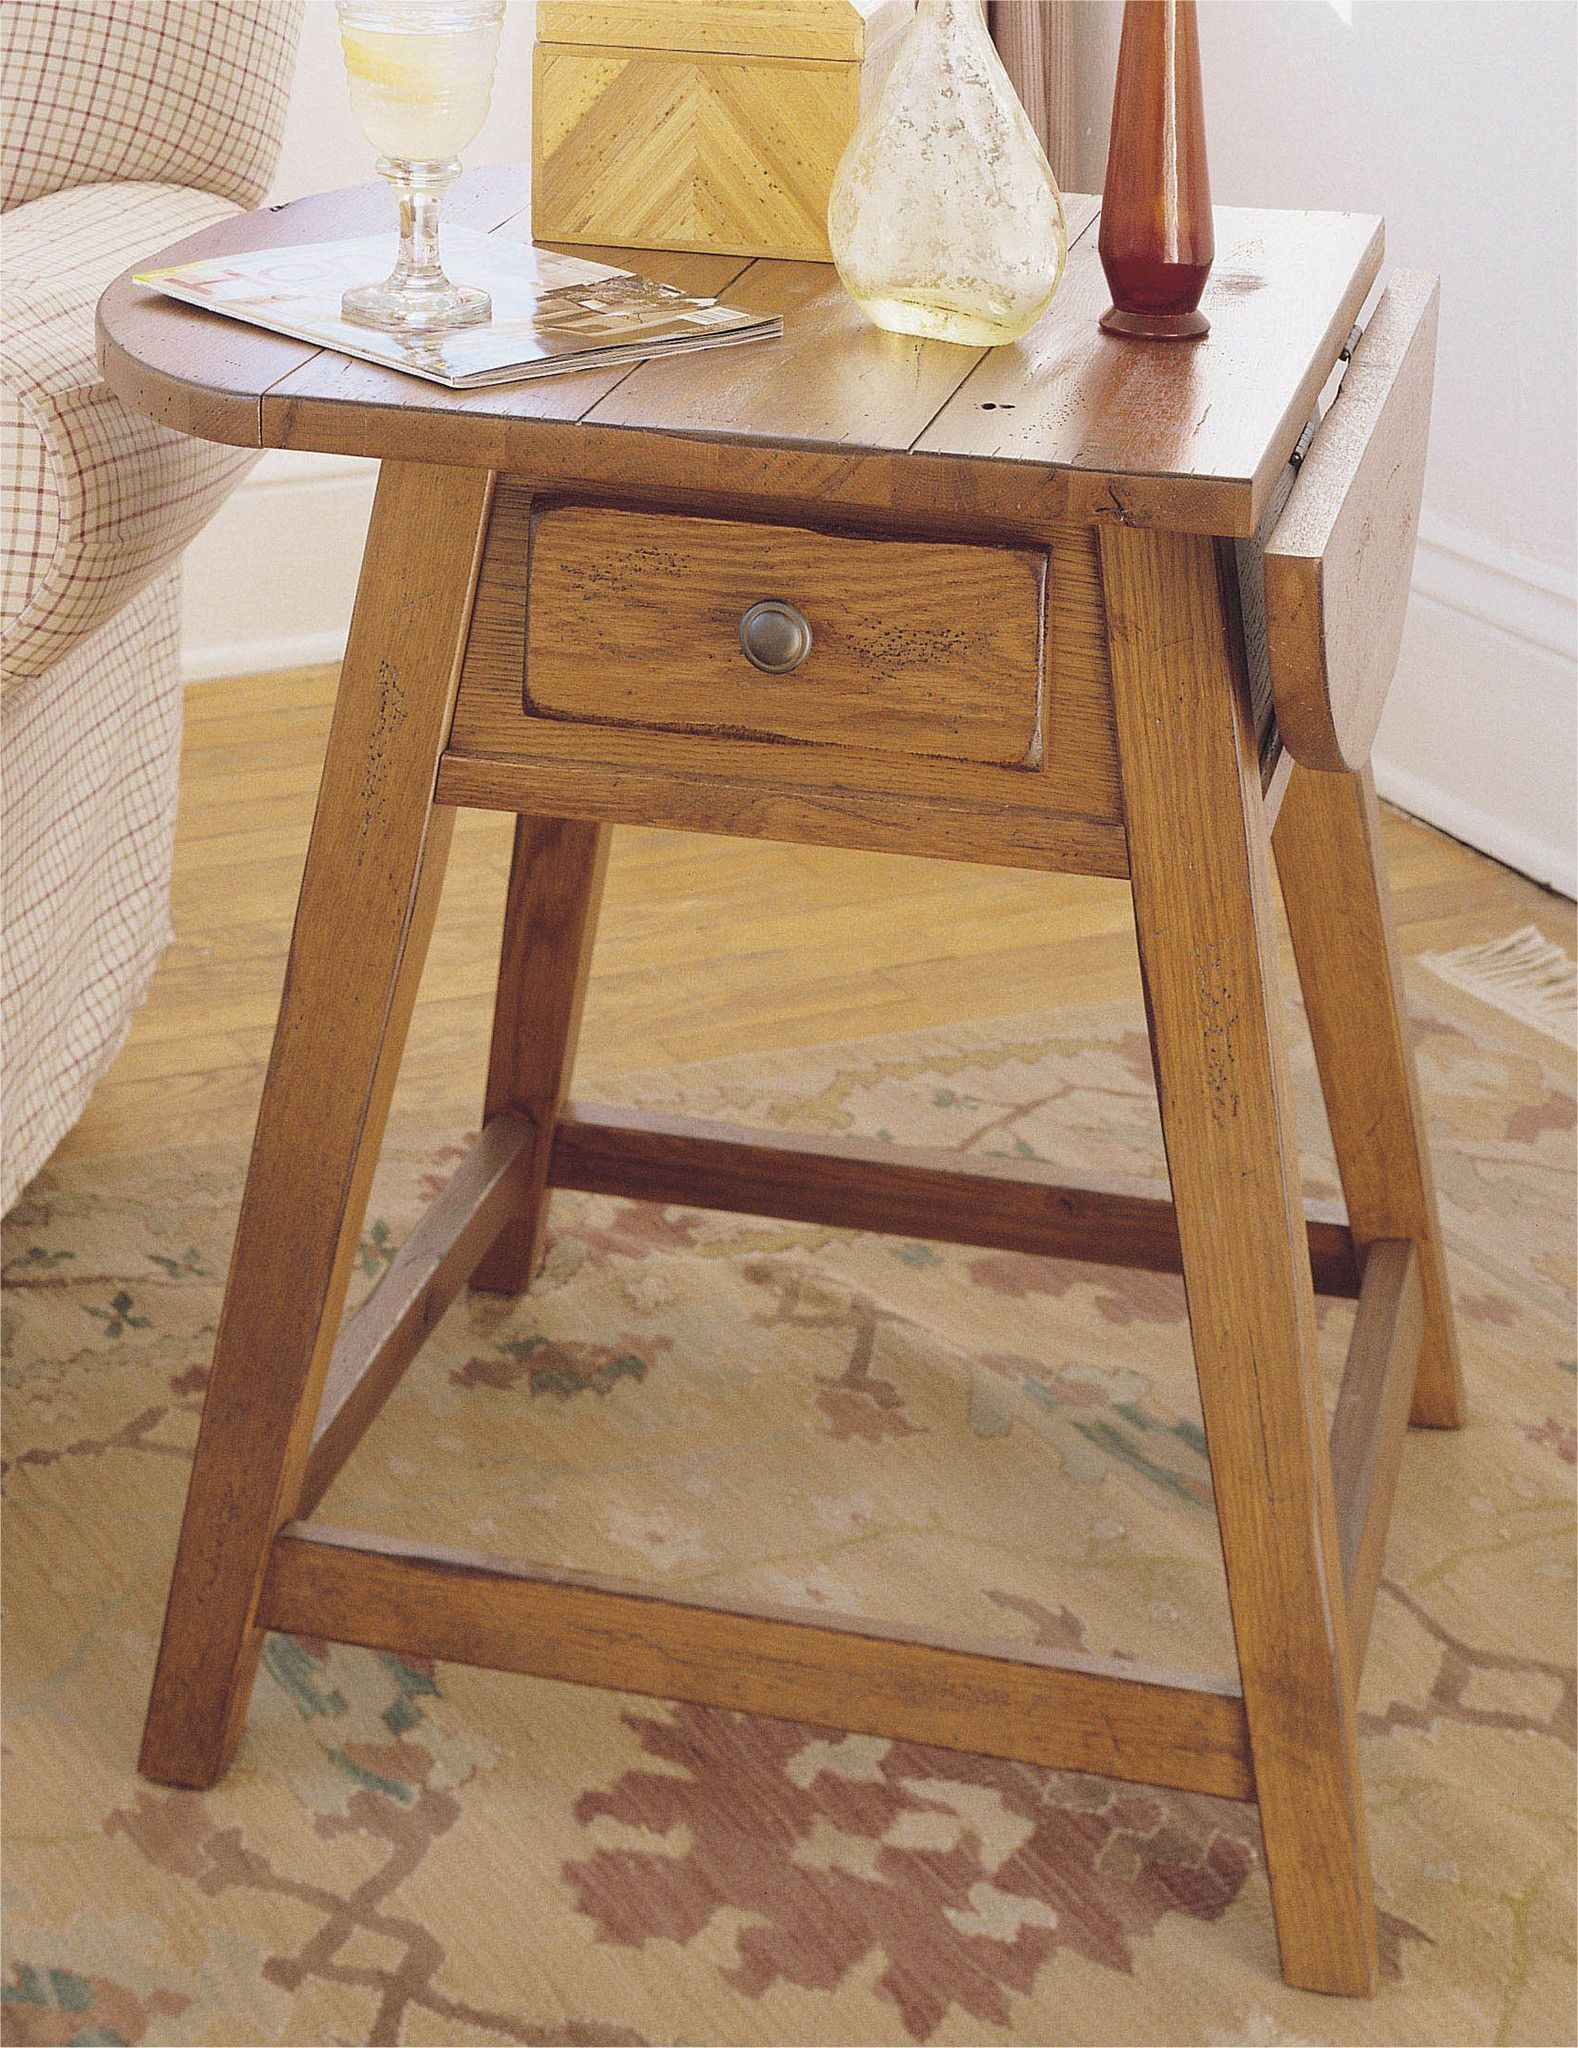 Broyhill Sofa Nebraska Furniture Mart Leather Cleaner India Attic Heirlooms Splay Leg End Table Original Oak By